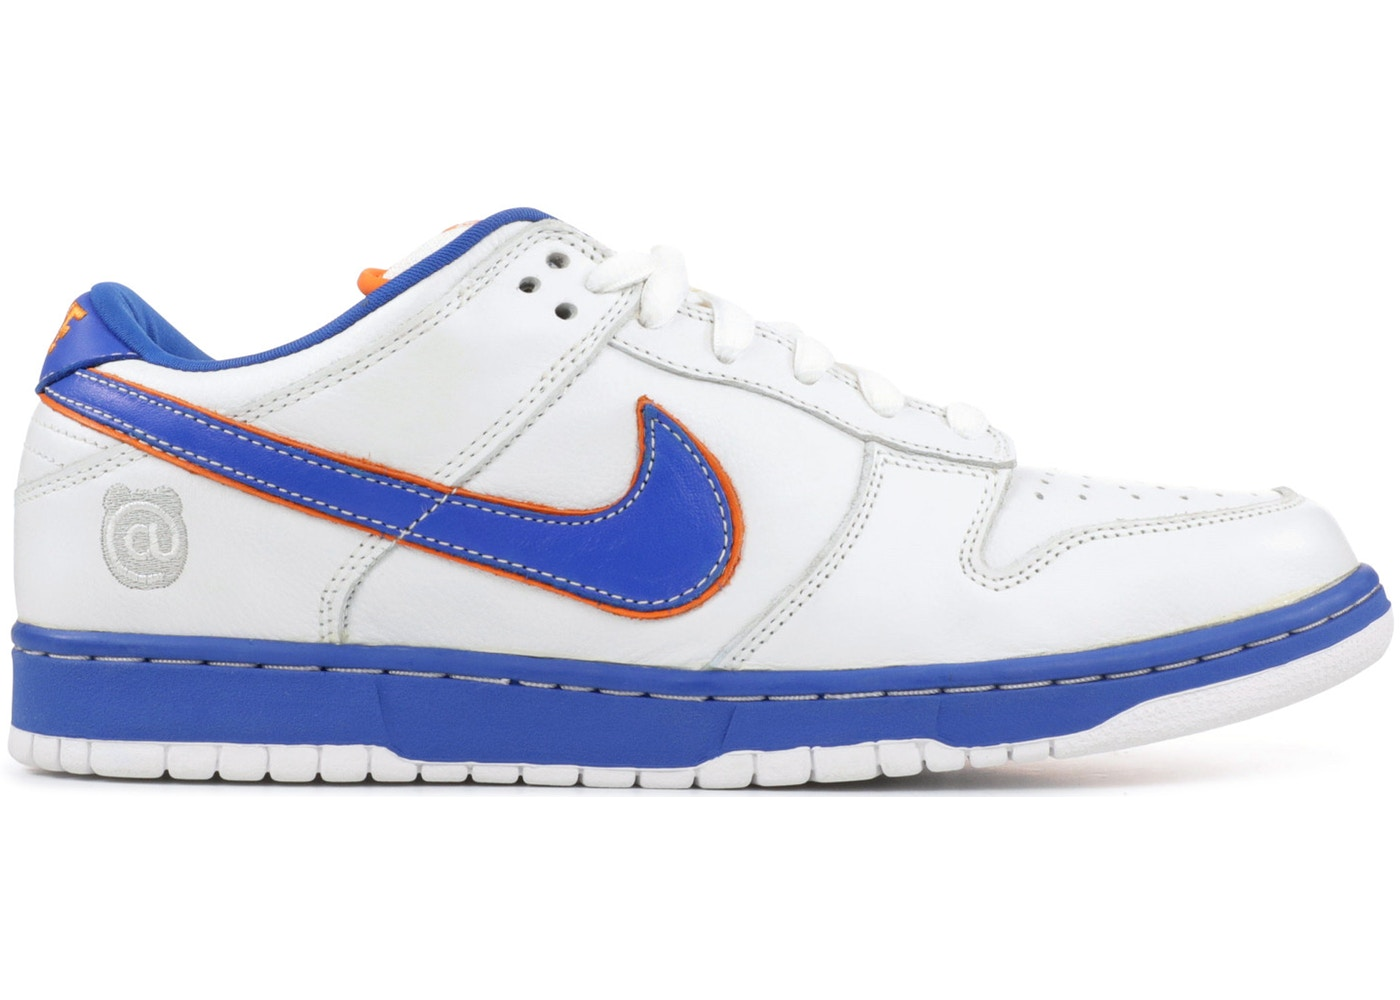 online store e3f8c a48f4 Nike SB Dunk Low Medicom 1 - 304292-142